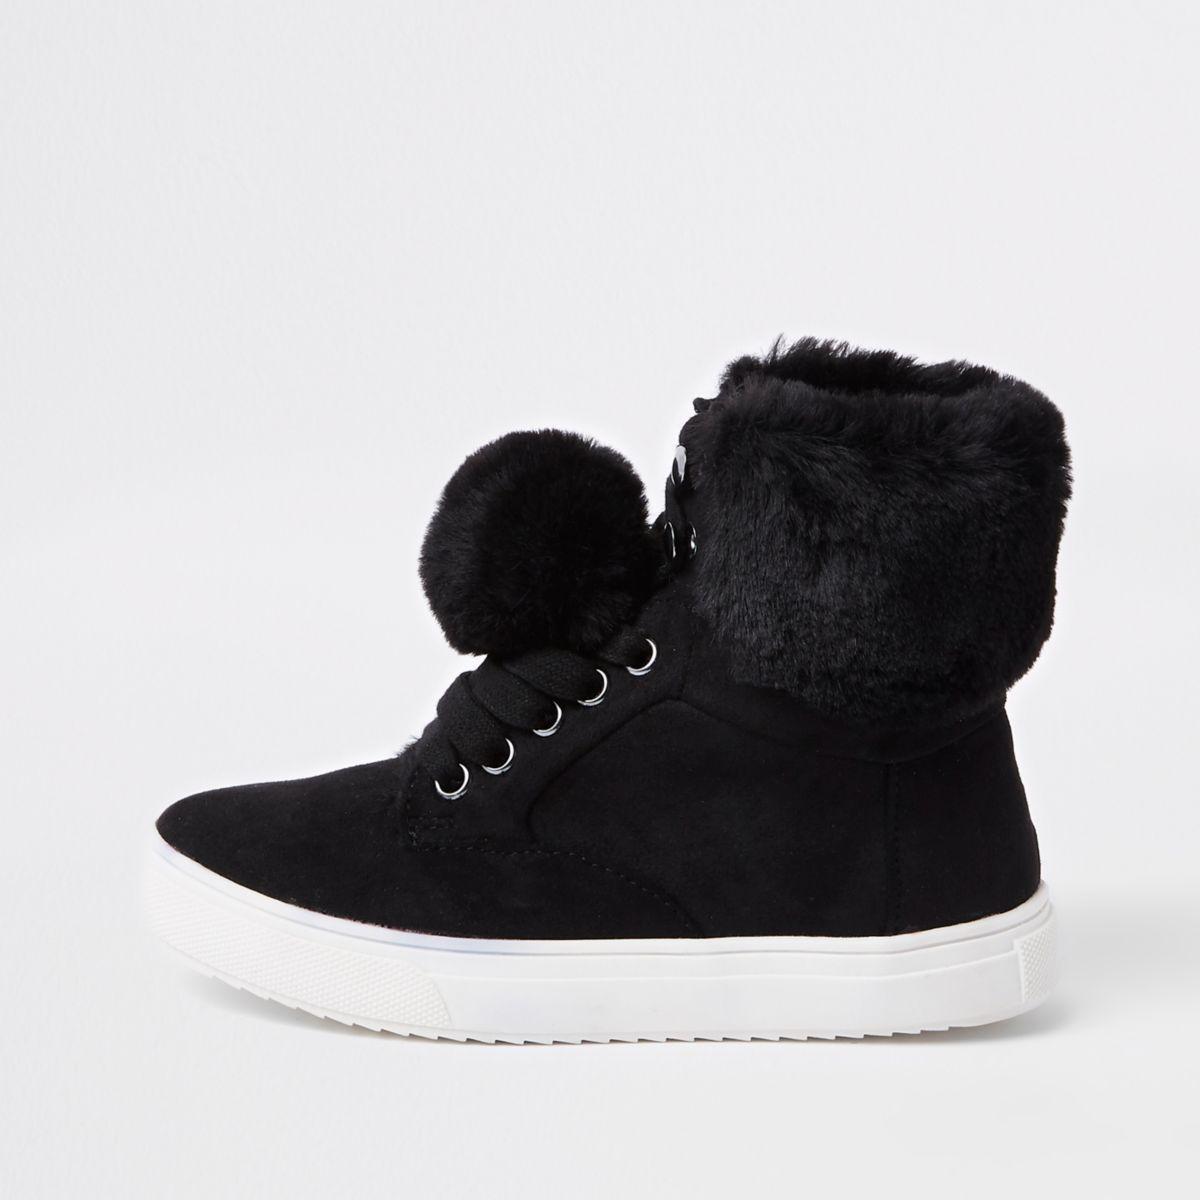 Girls black faux fur high top sneakers